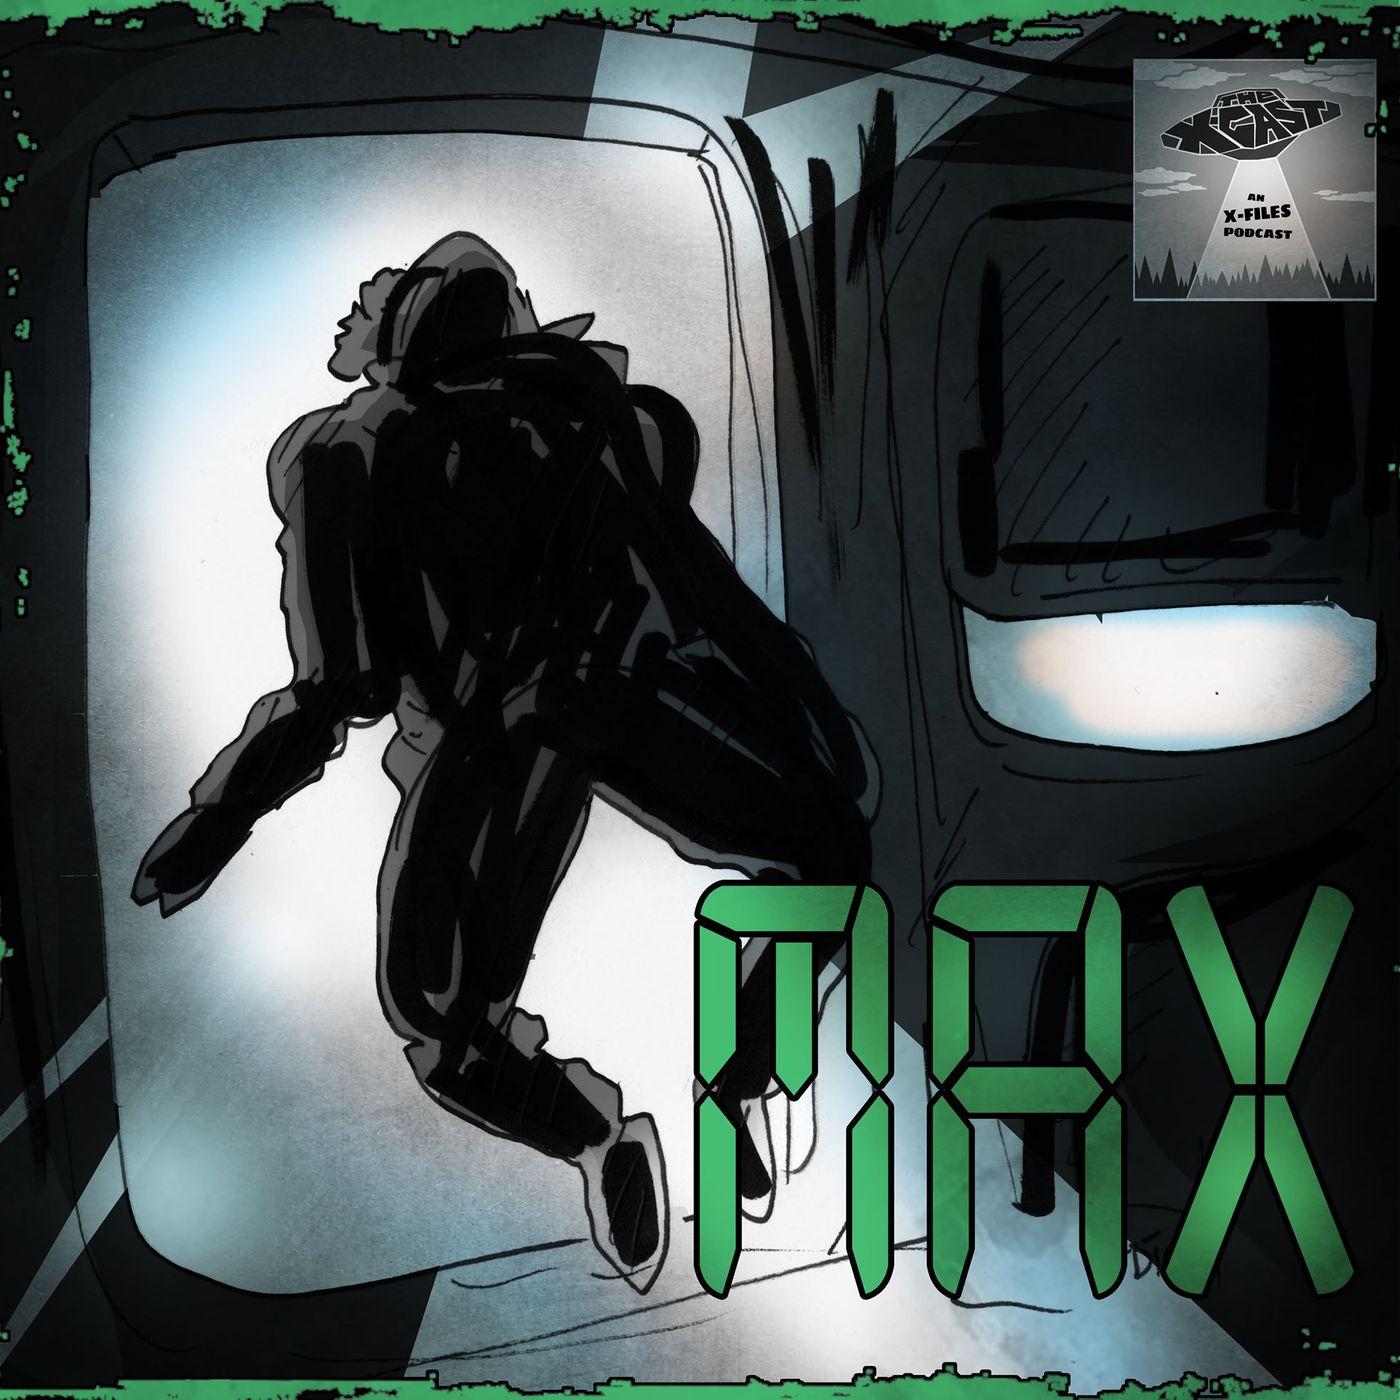 344. Max